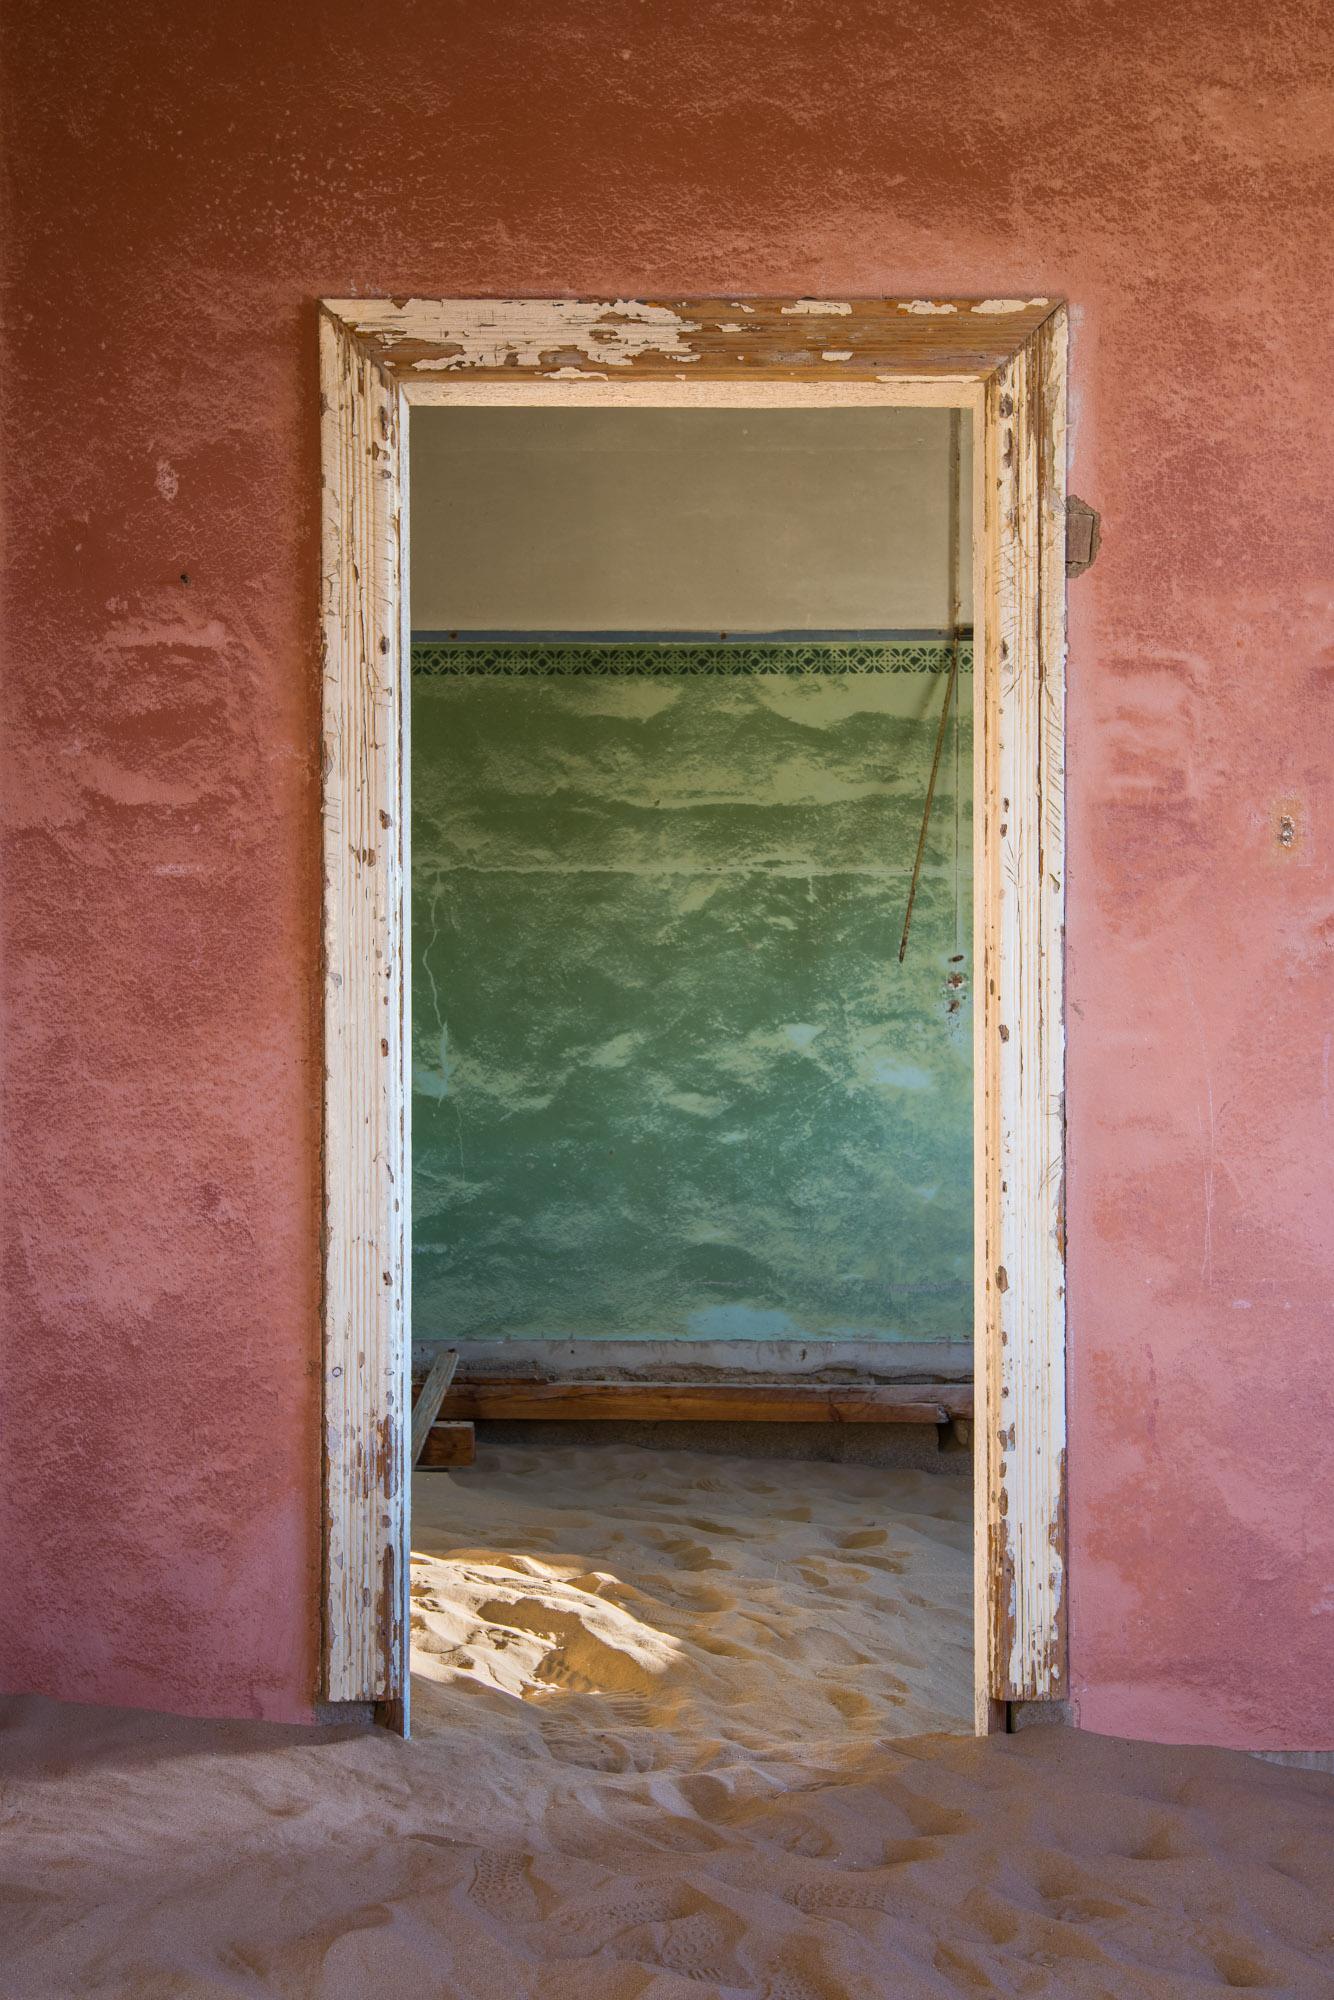 Doorway in a Derelict House, Kolmanskop, Namibia